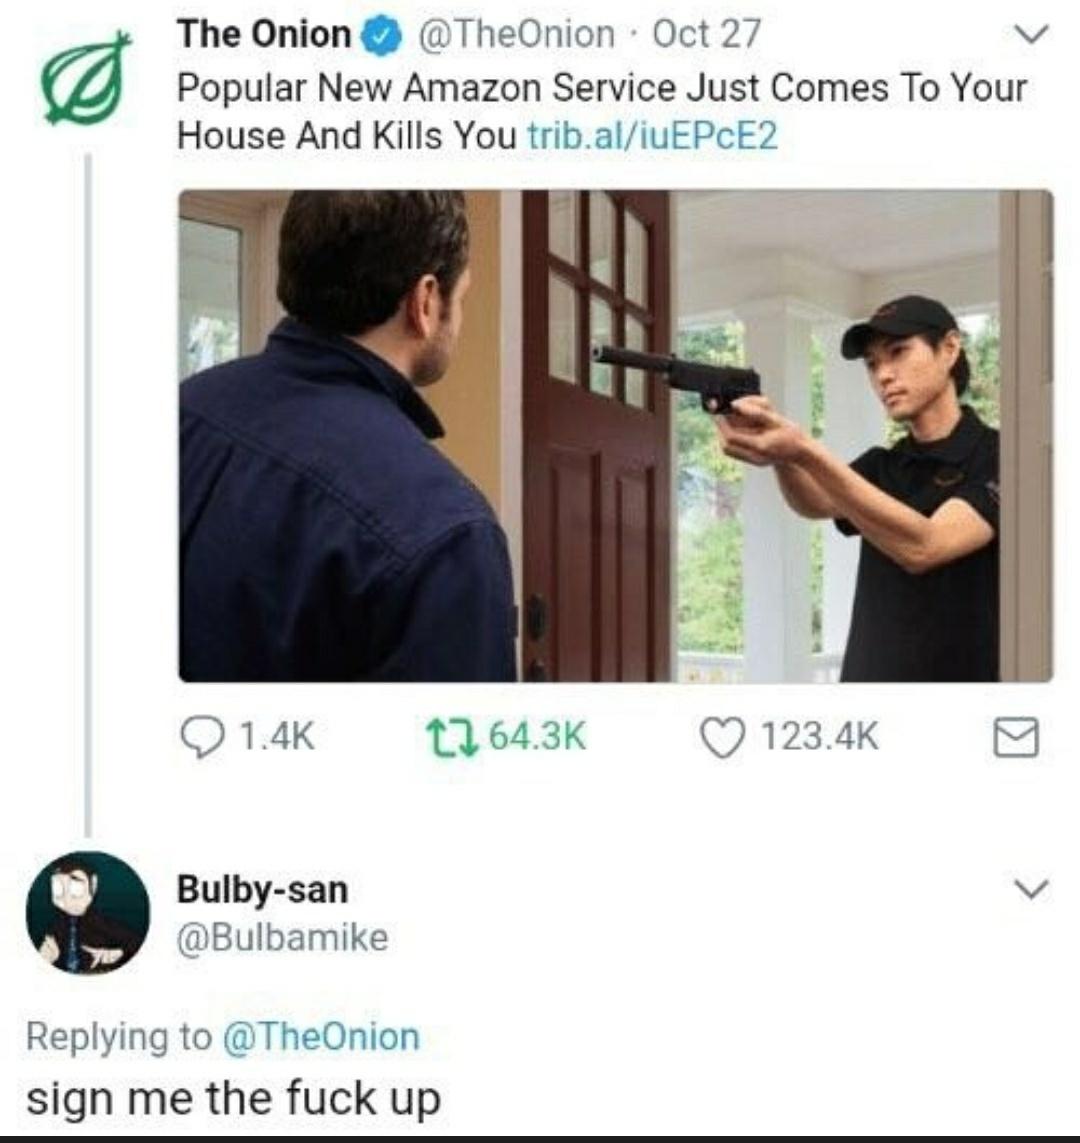 Where can we pre-order - meme